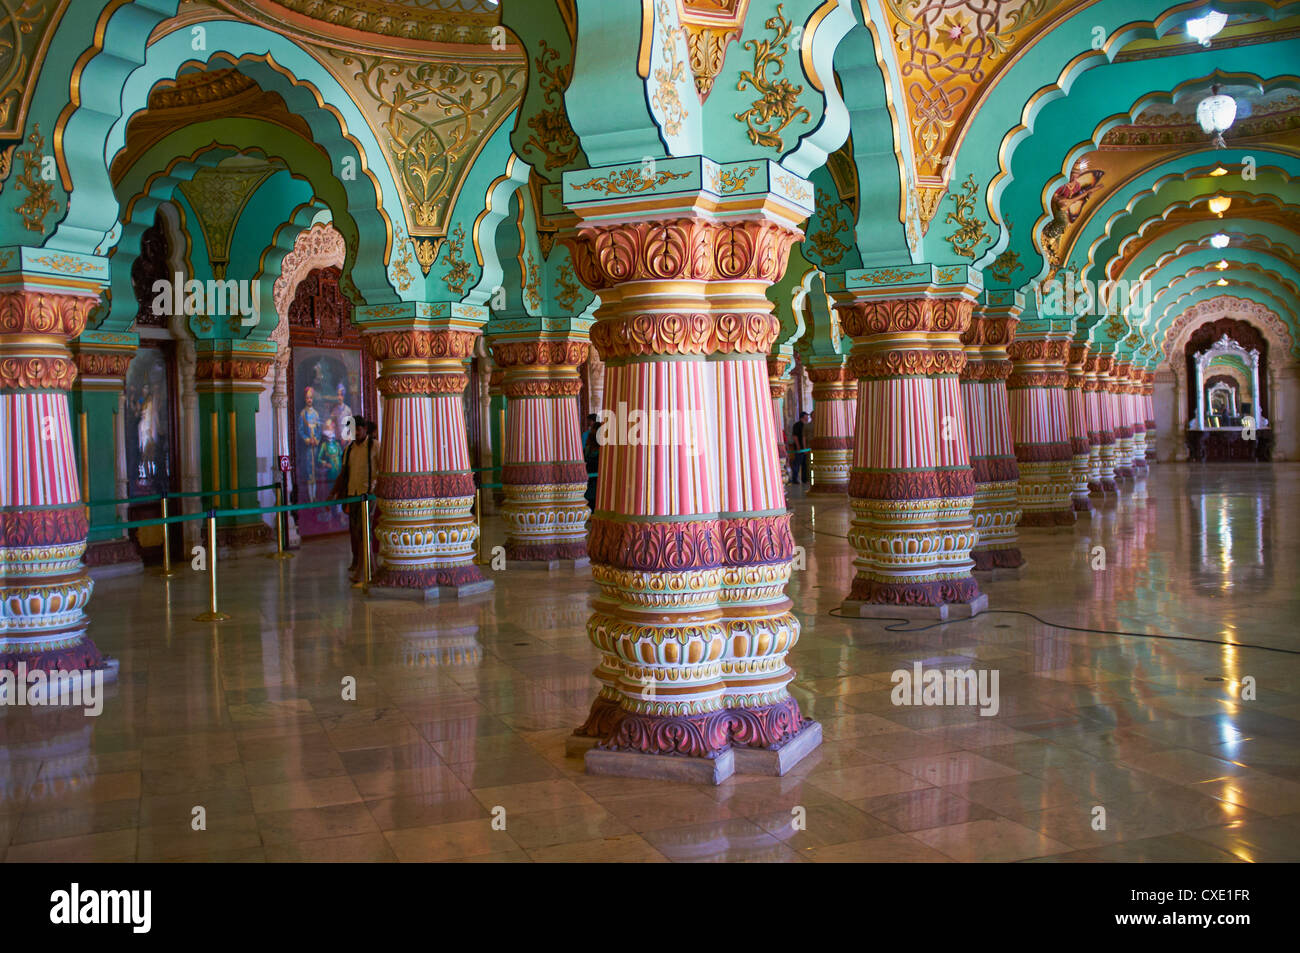 Interieur, Maharaja Palast, Mysore, Karnataka, Indien, Asien Stockbild